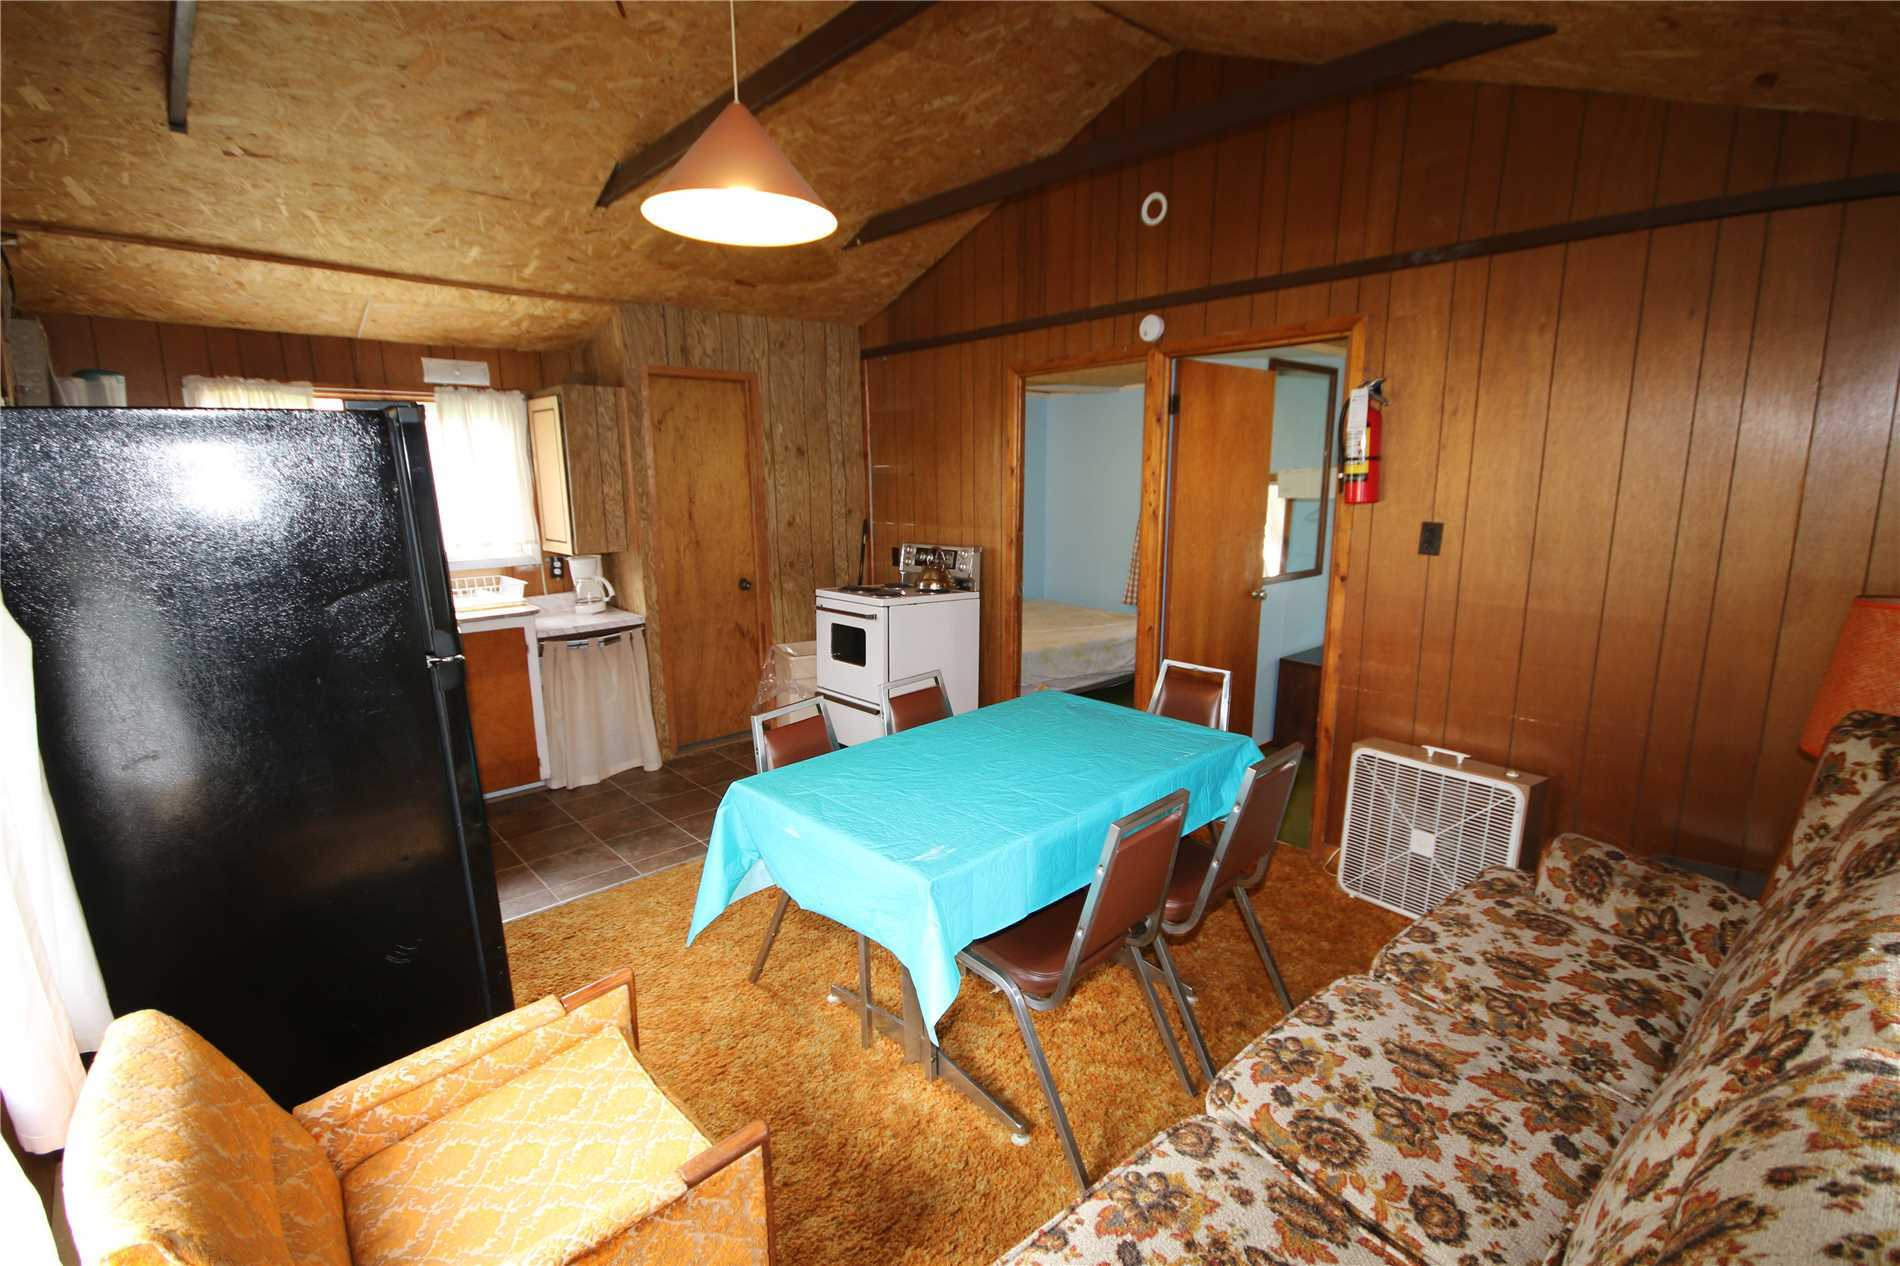 230-232 Lake Dalrymple Rd, Kawartha Lakes X4511013